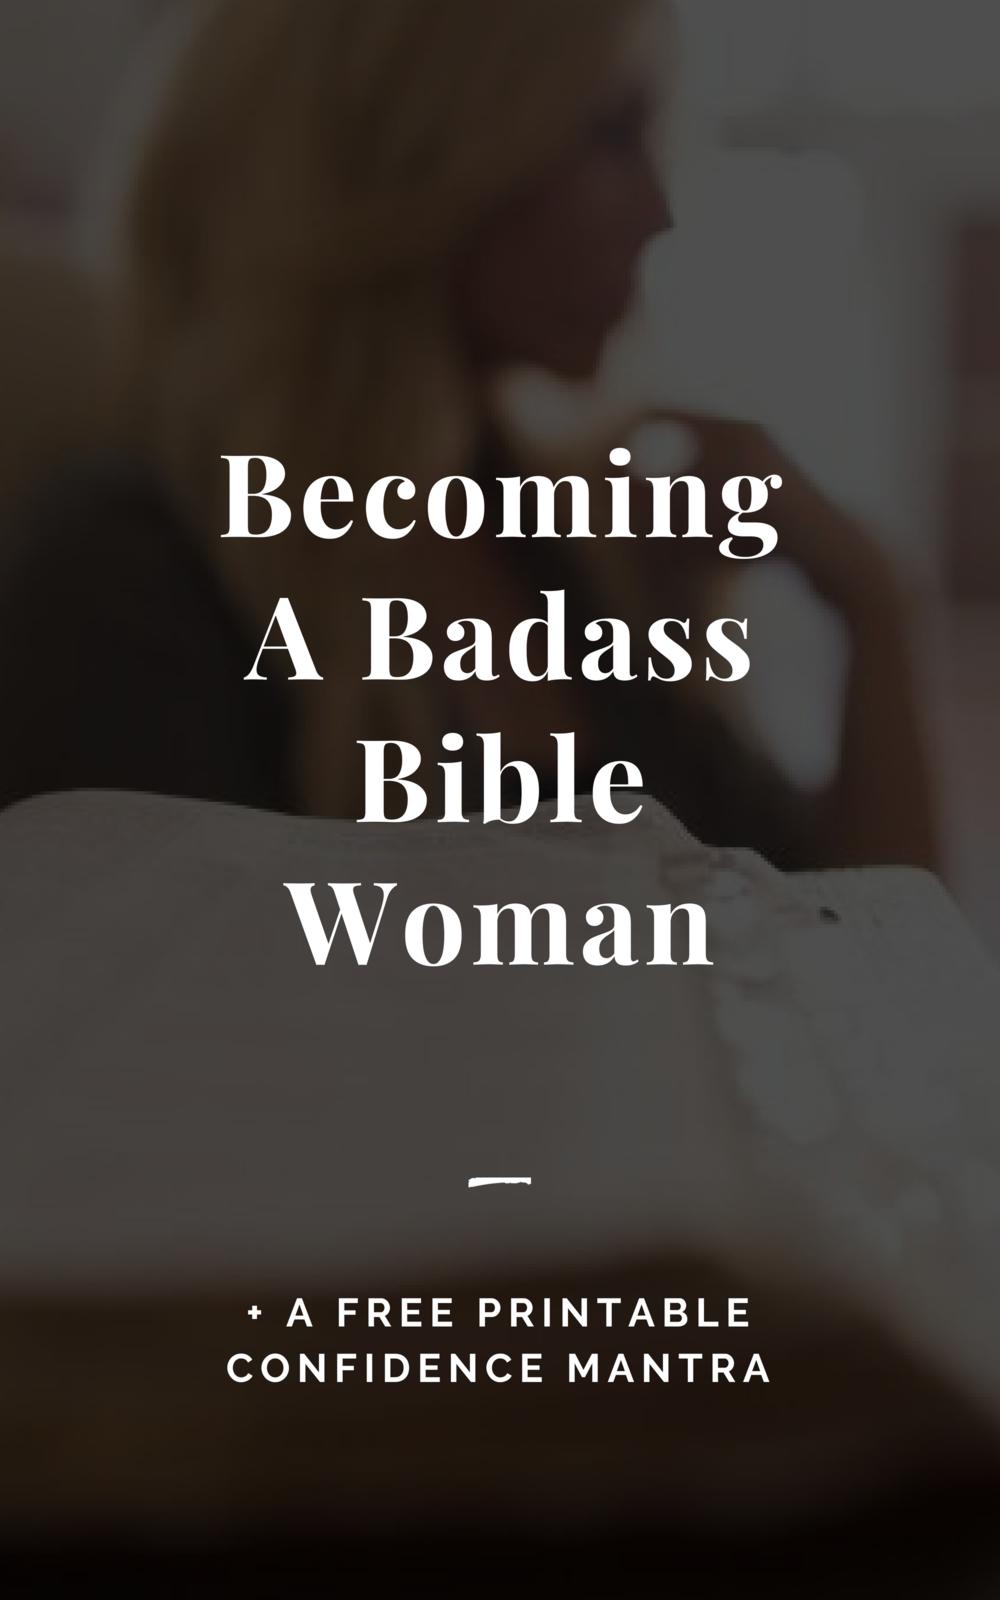 Becoming a badass bible woman